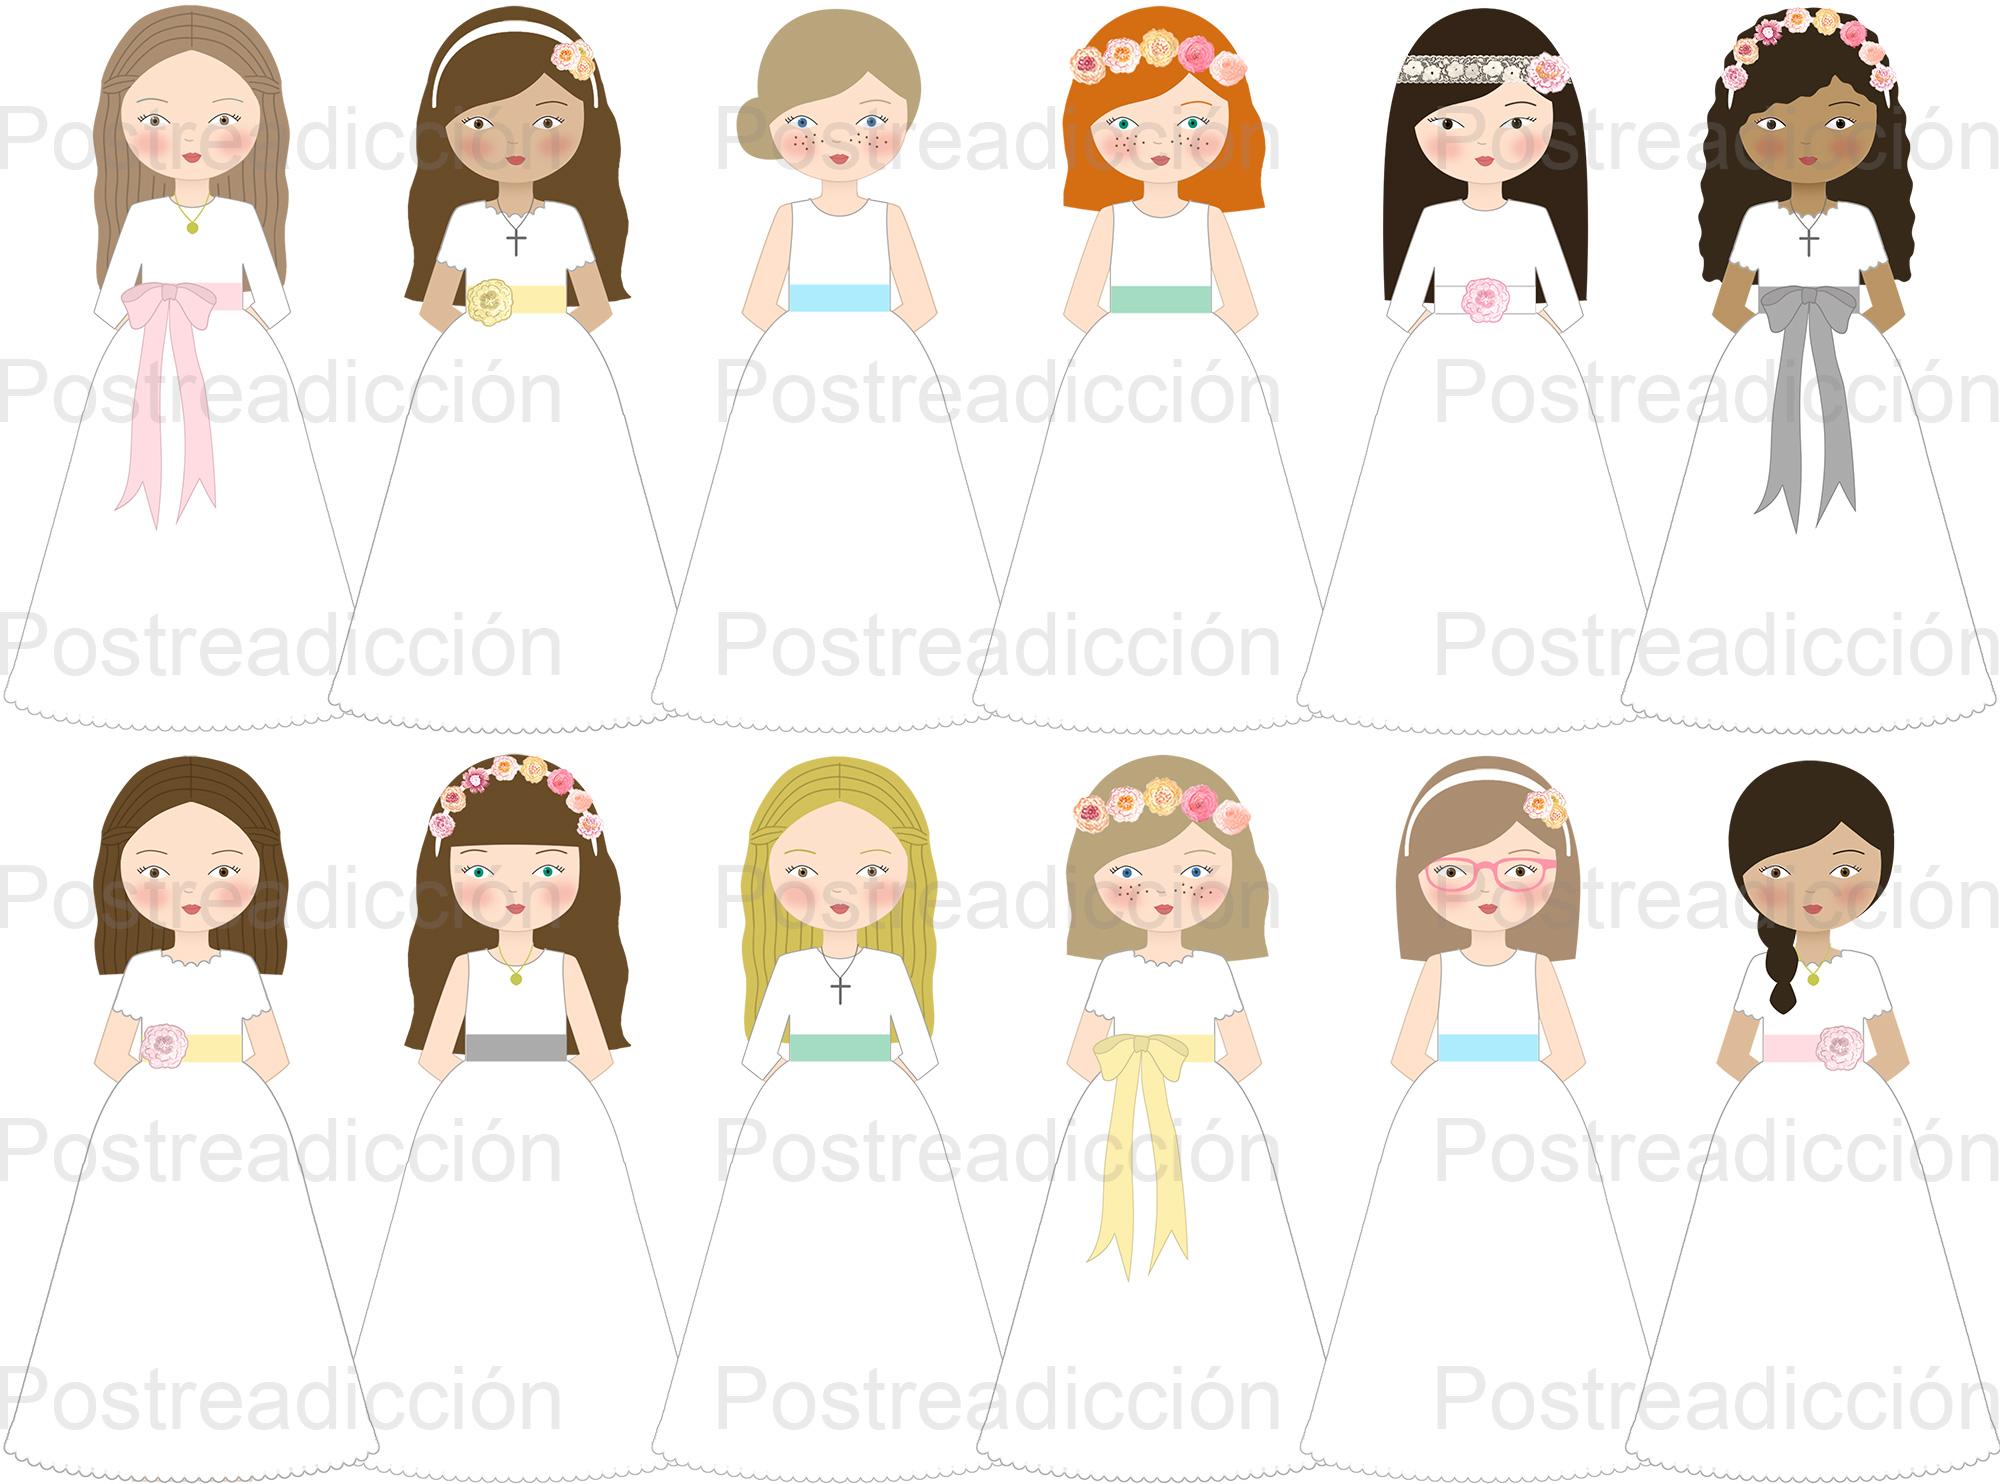 Imagen de producto: https://tienda.postreadiccion.com/img/articulos/secundarias12788-modelo-no-1515-nina-de-comunion-carlota-1.jpg